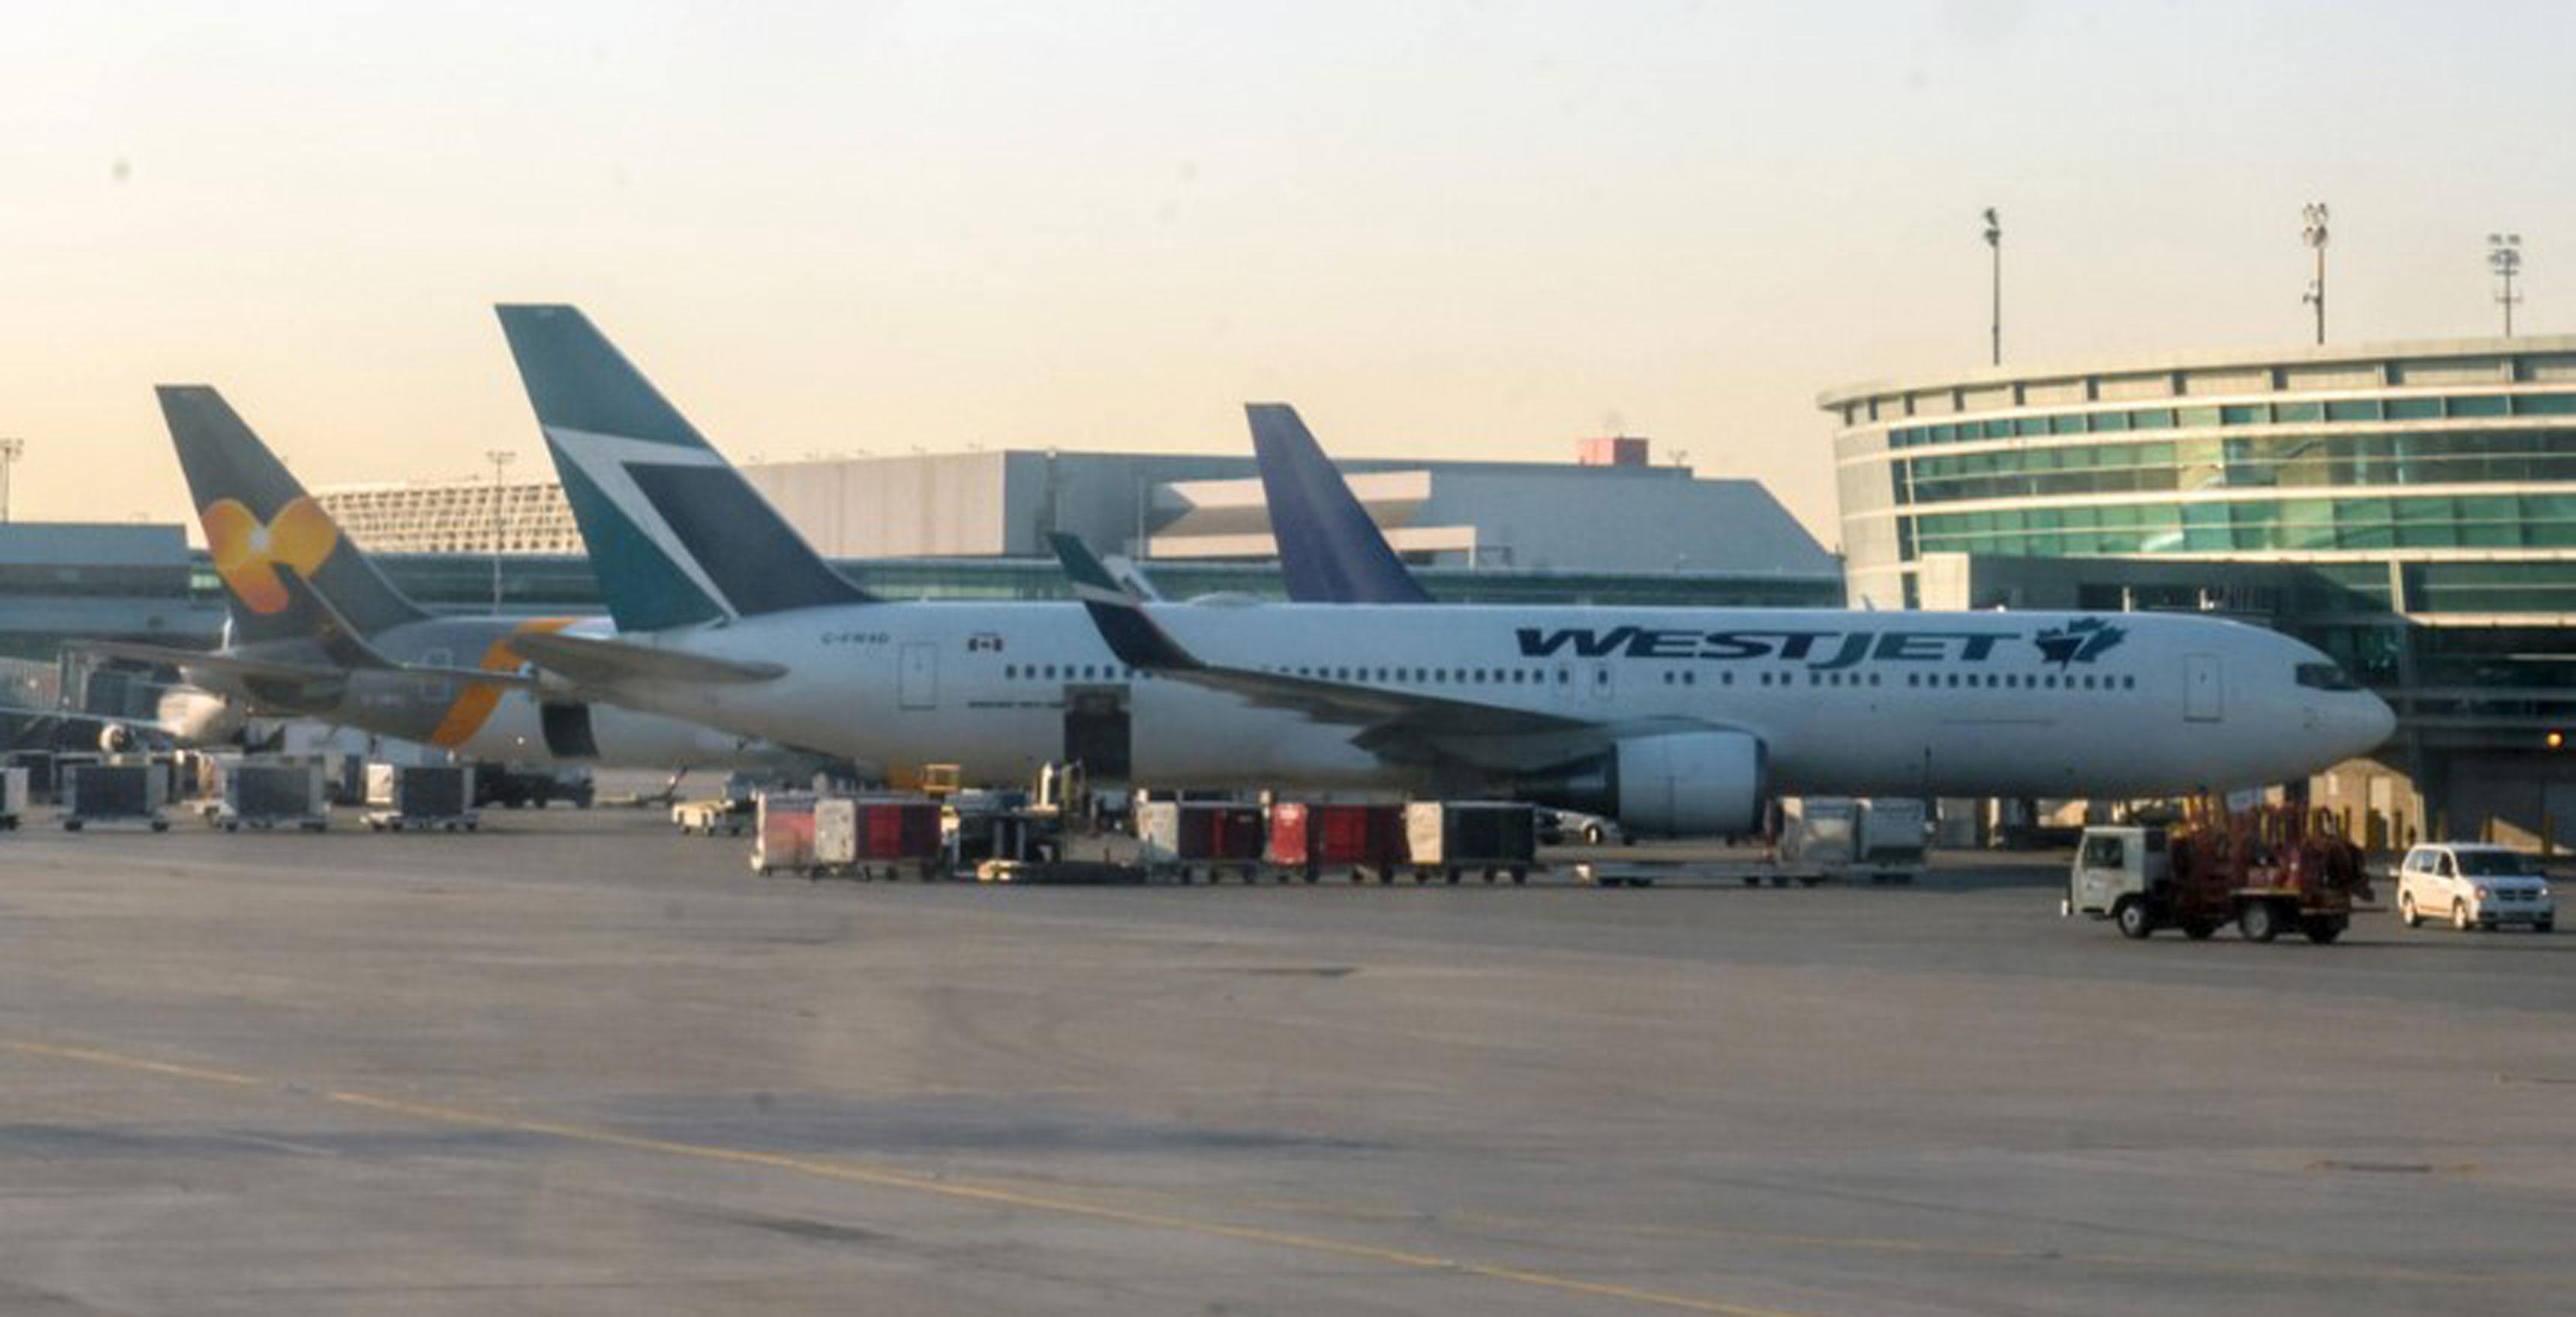 Toronto's Pearson Airport